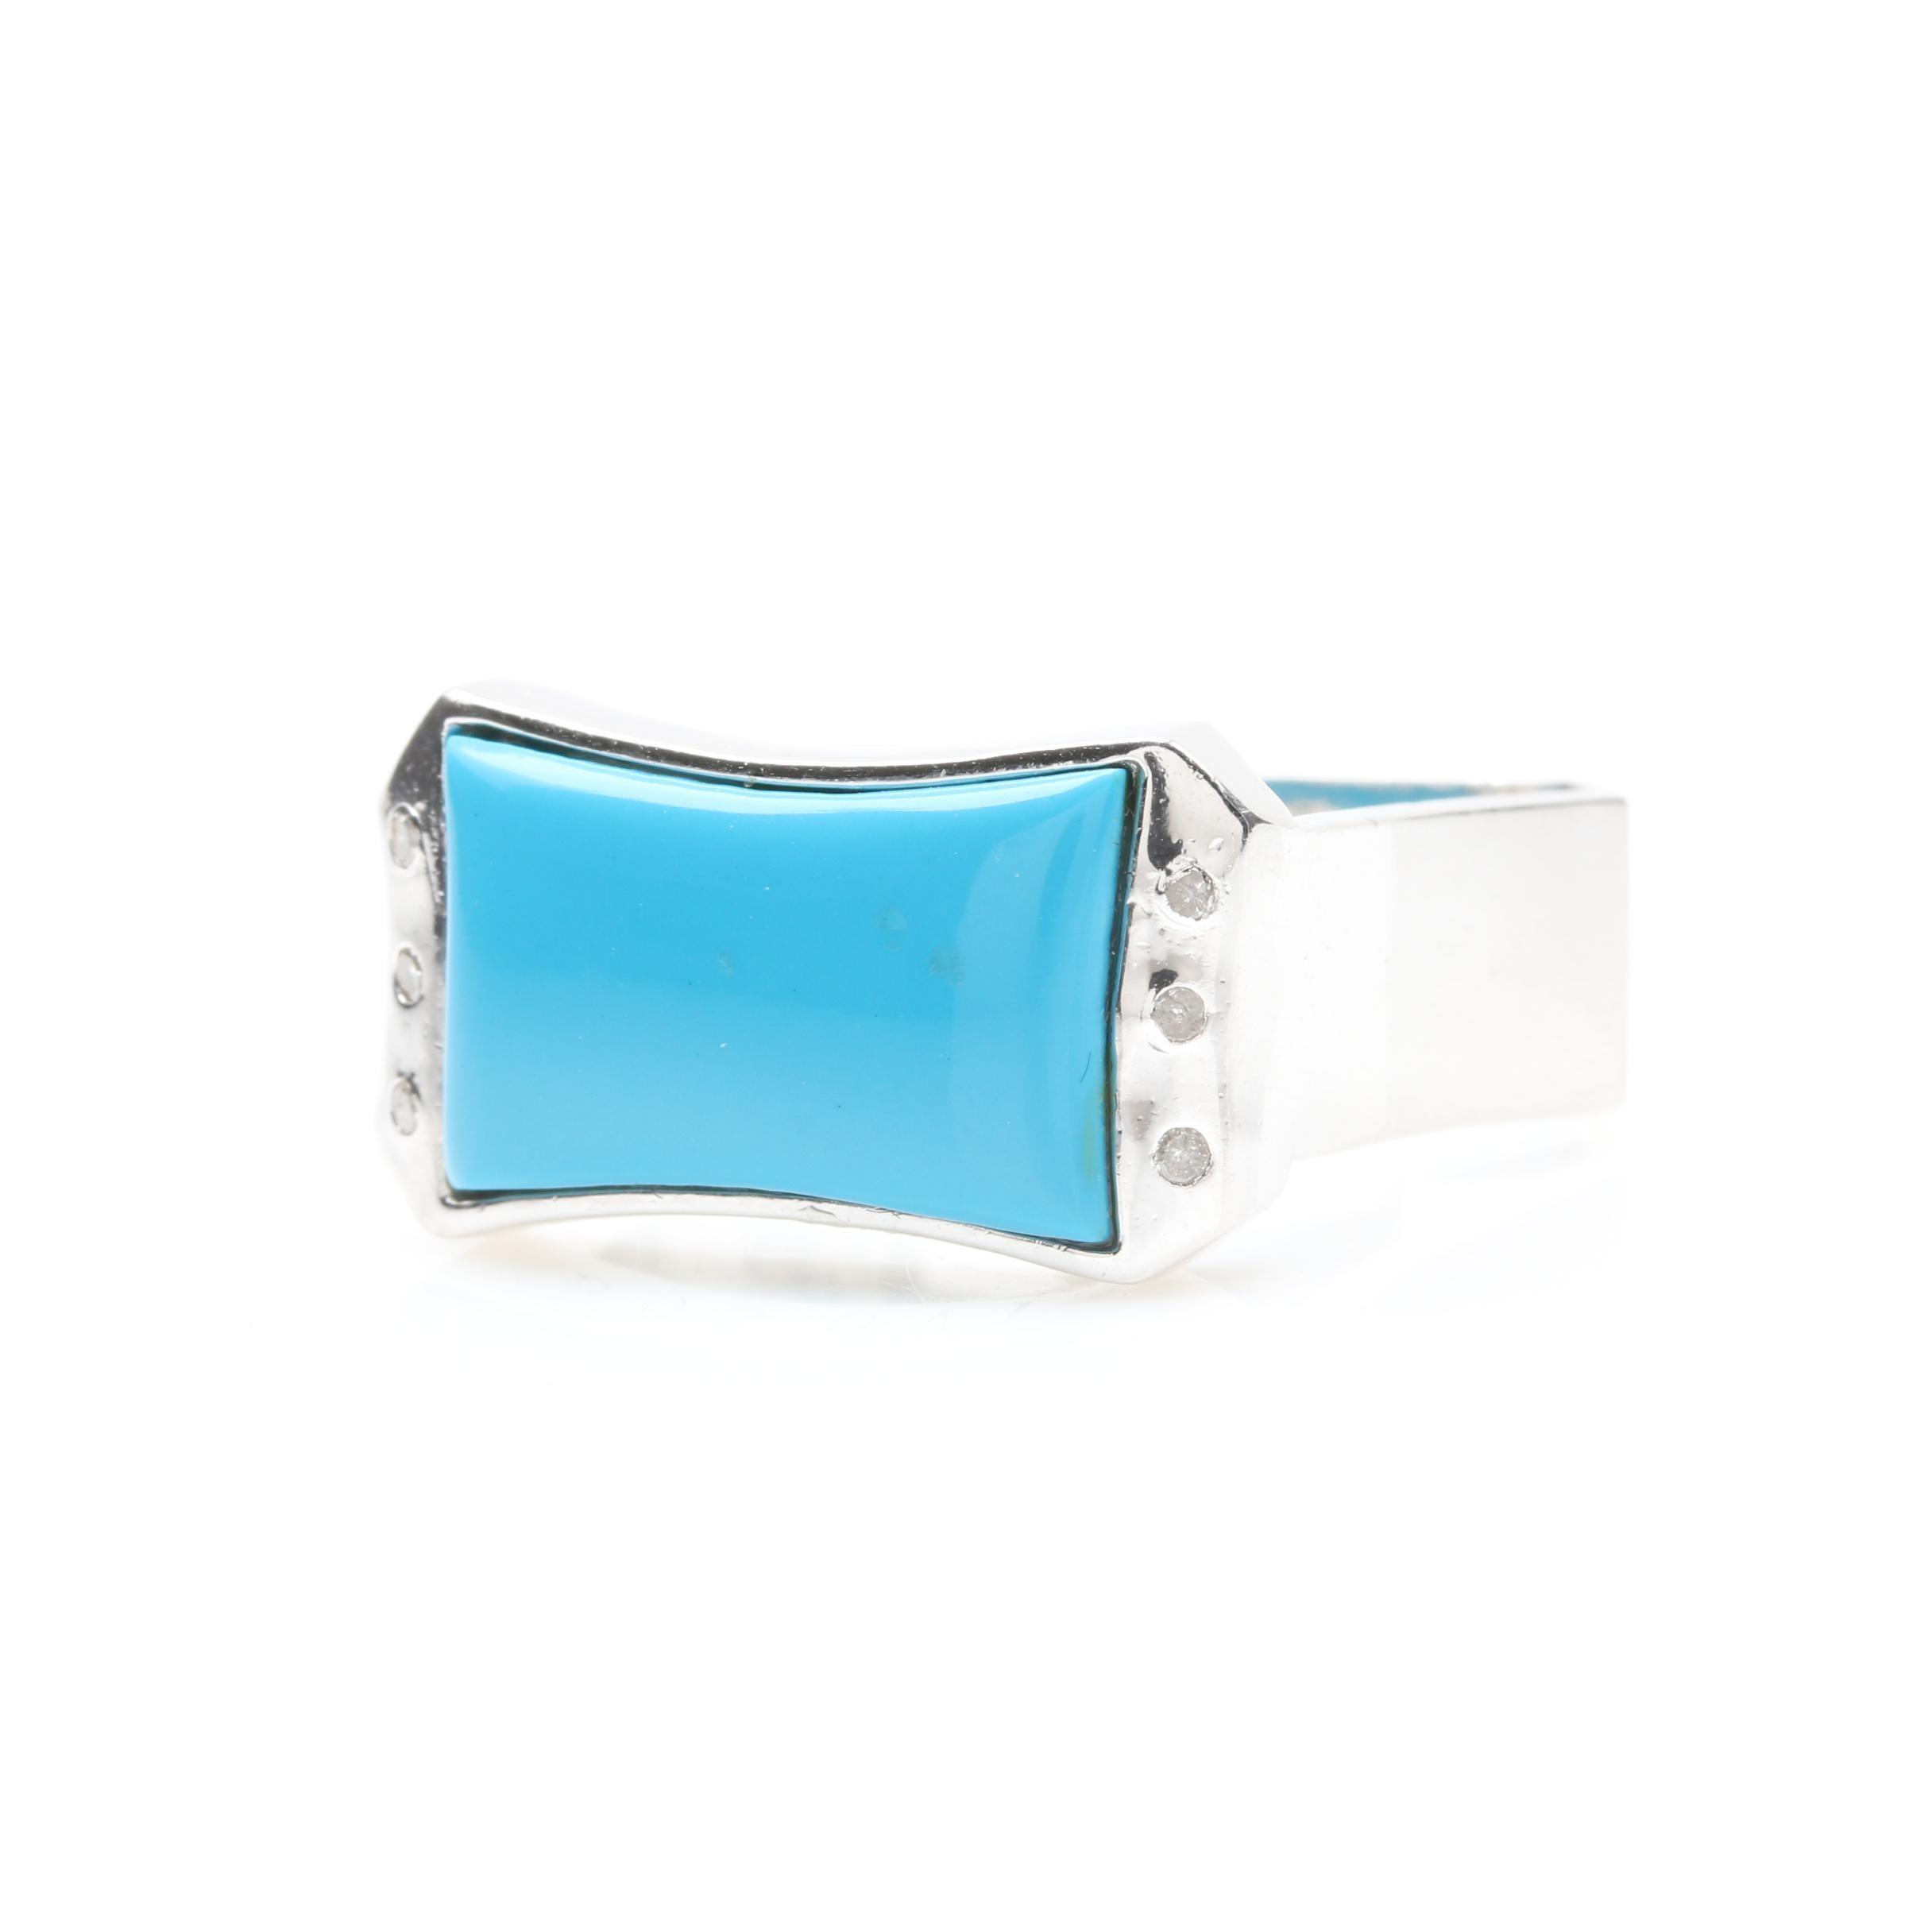 Bosovi Sterling Silver Imitation Turquoise and Diamond Ring